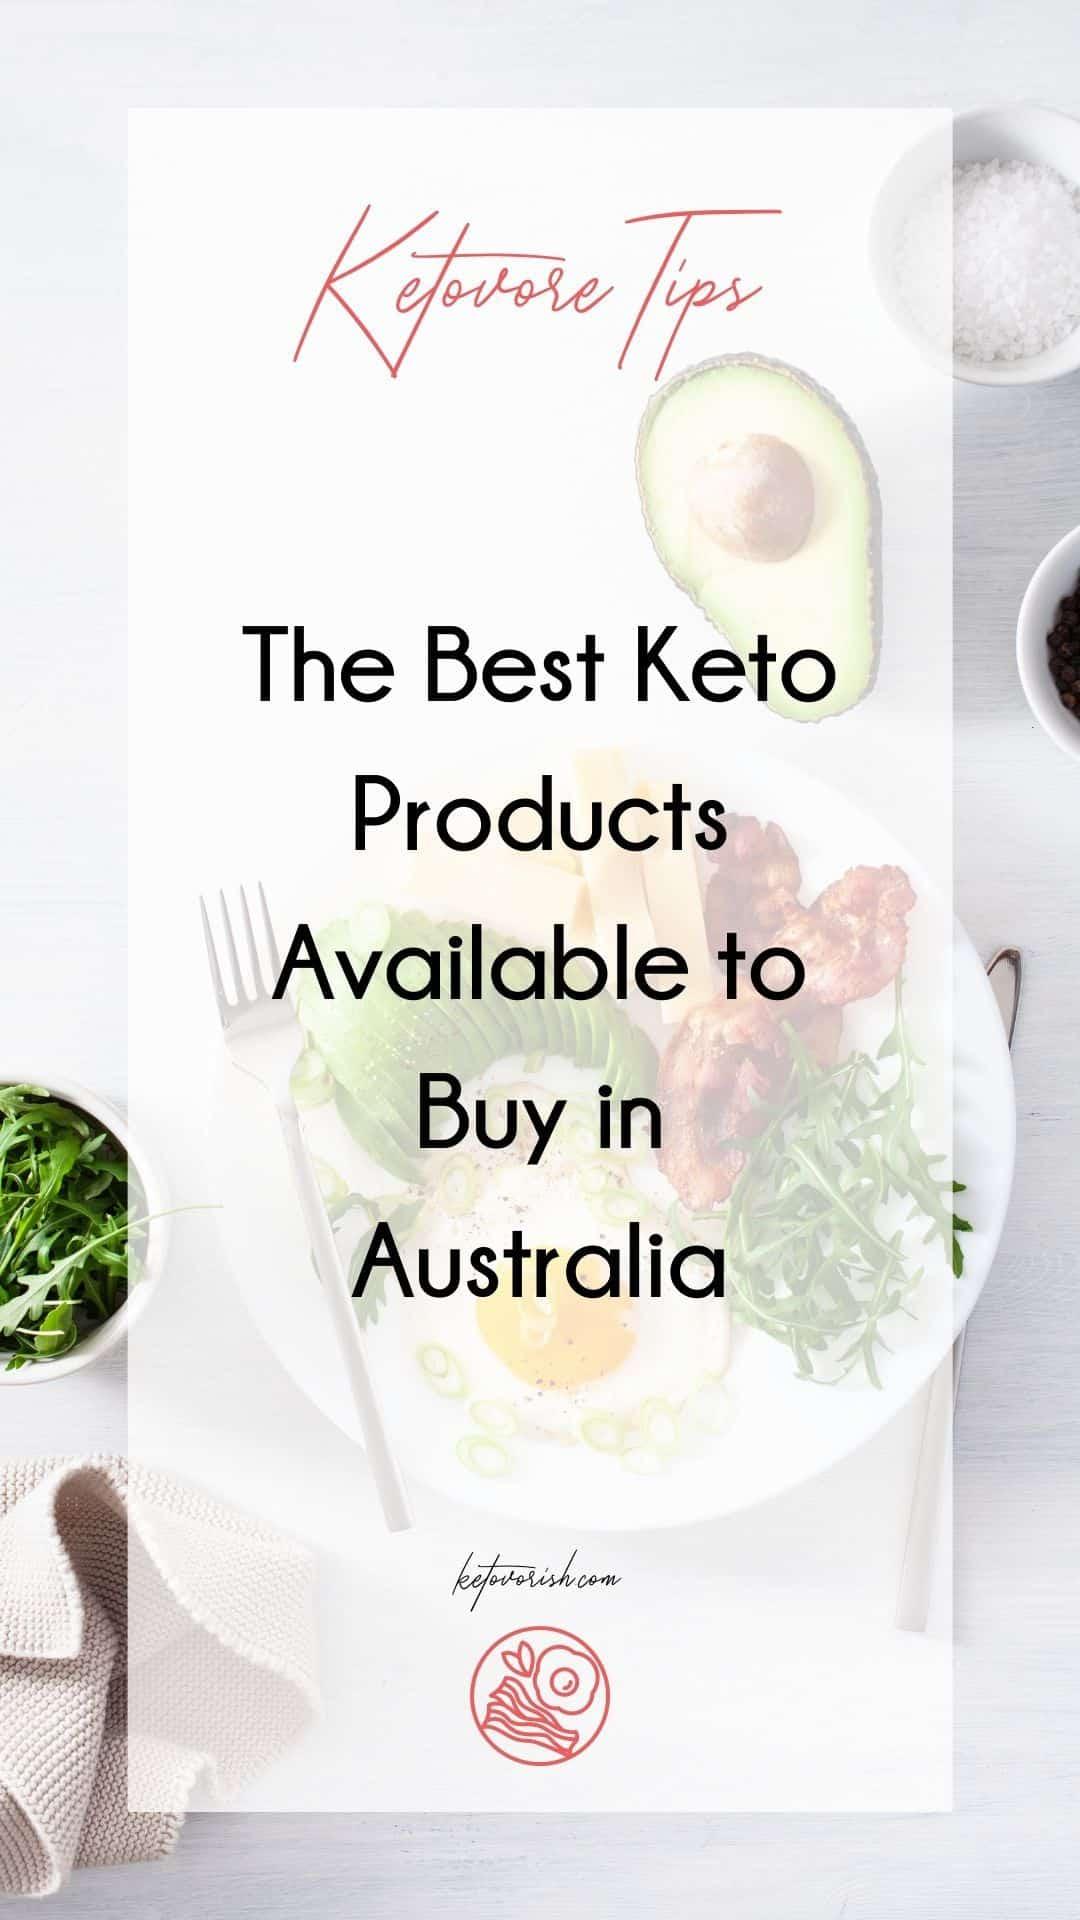 keto supplies Australia